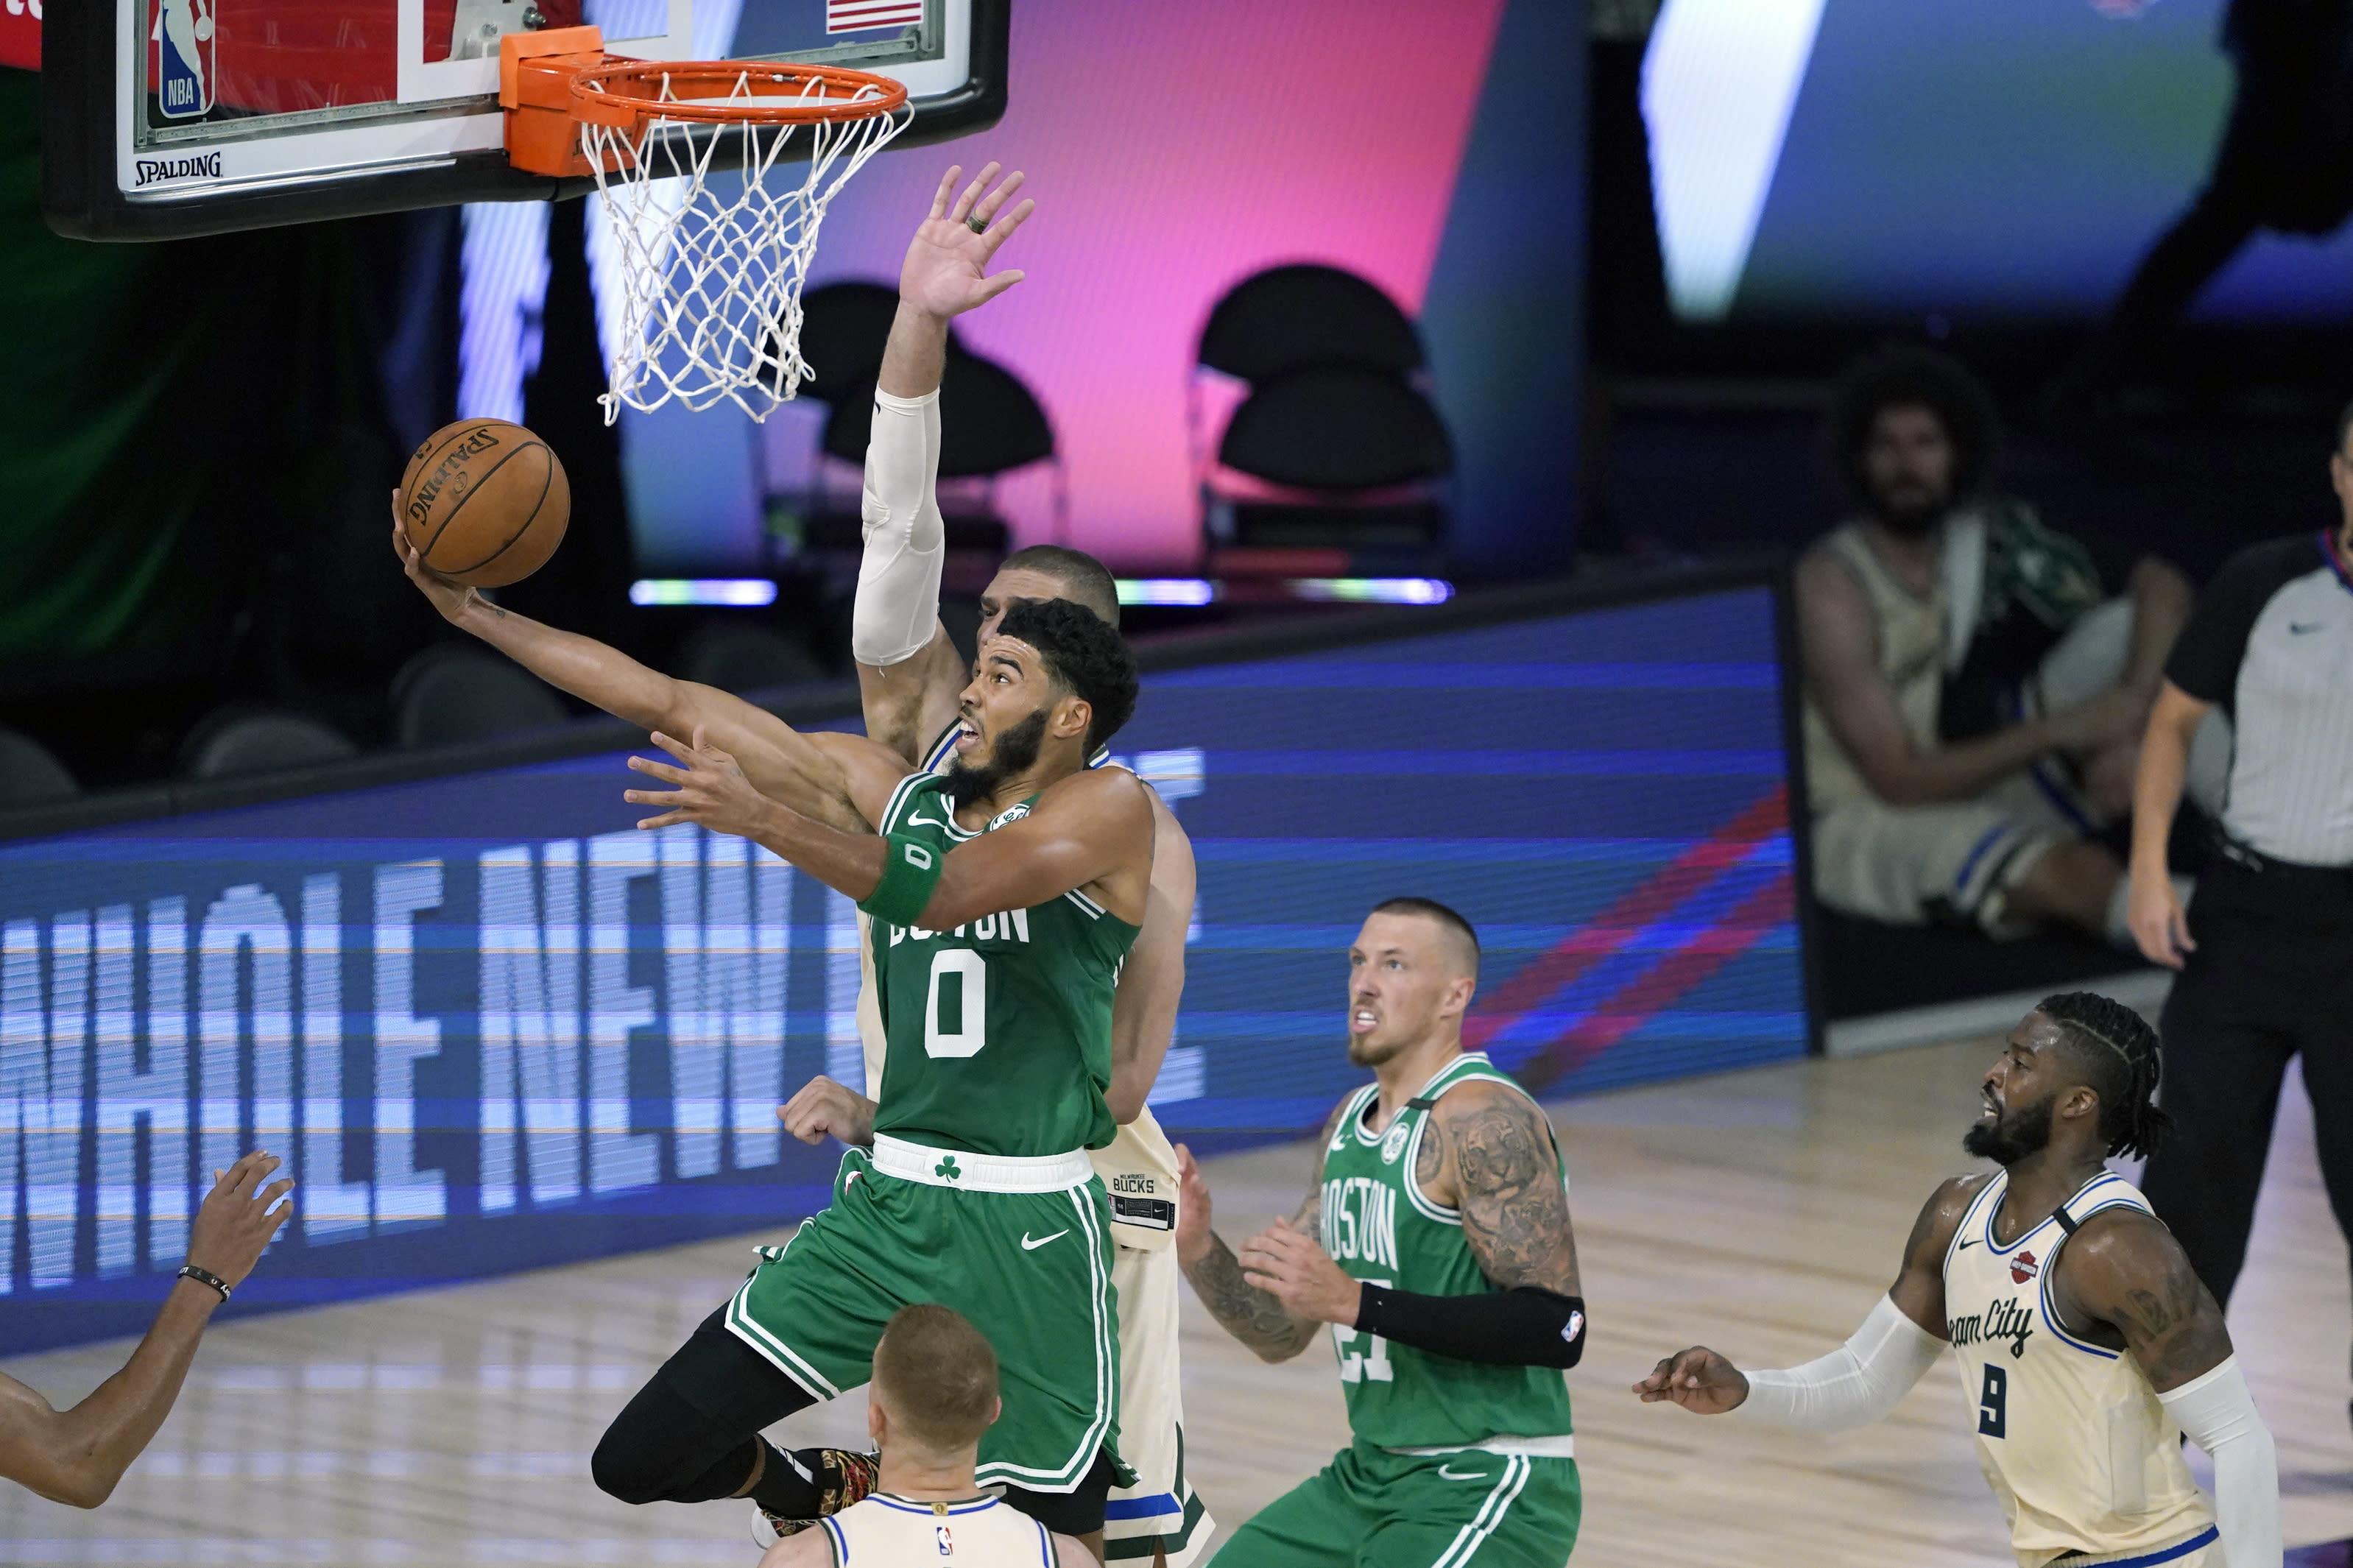 Boston Celtics' Jayson Tatum (0) heads to the basket during the first half of an NBA basketball game against the Milwaukee Bucks Friday, July 31, 2020, in Lake Buena Vista, Fla. (AP Photo/Ashley Landis, Pool)